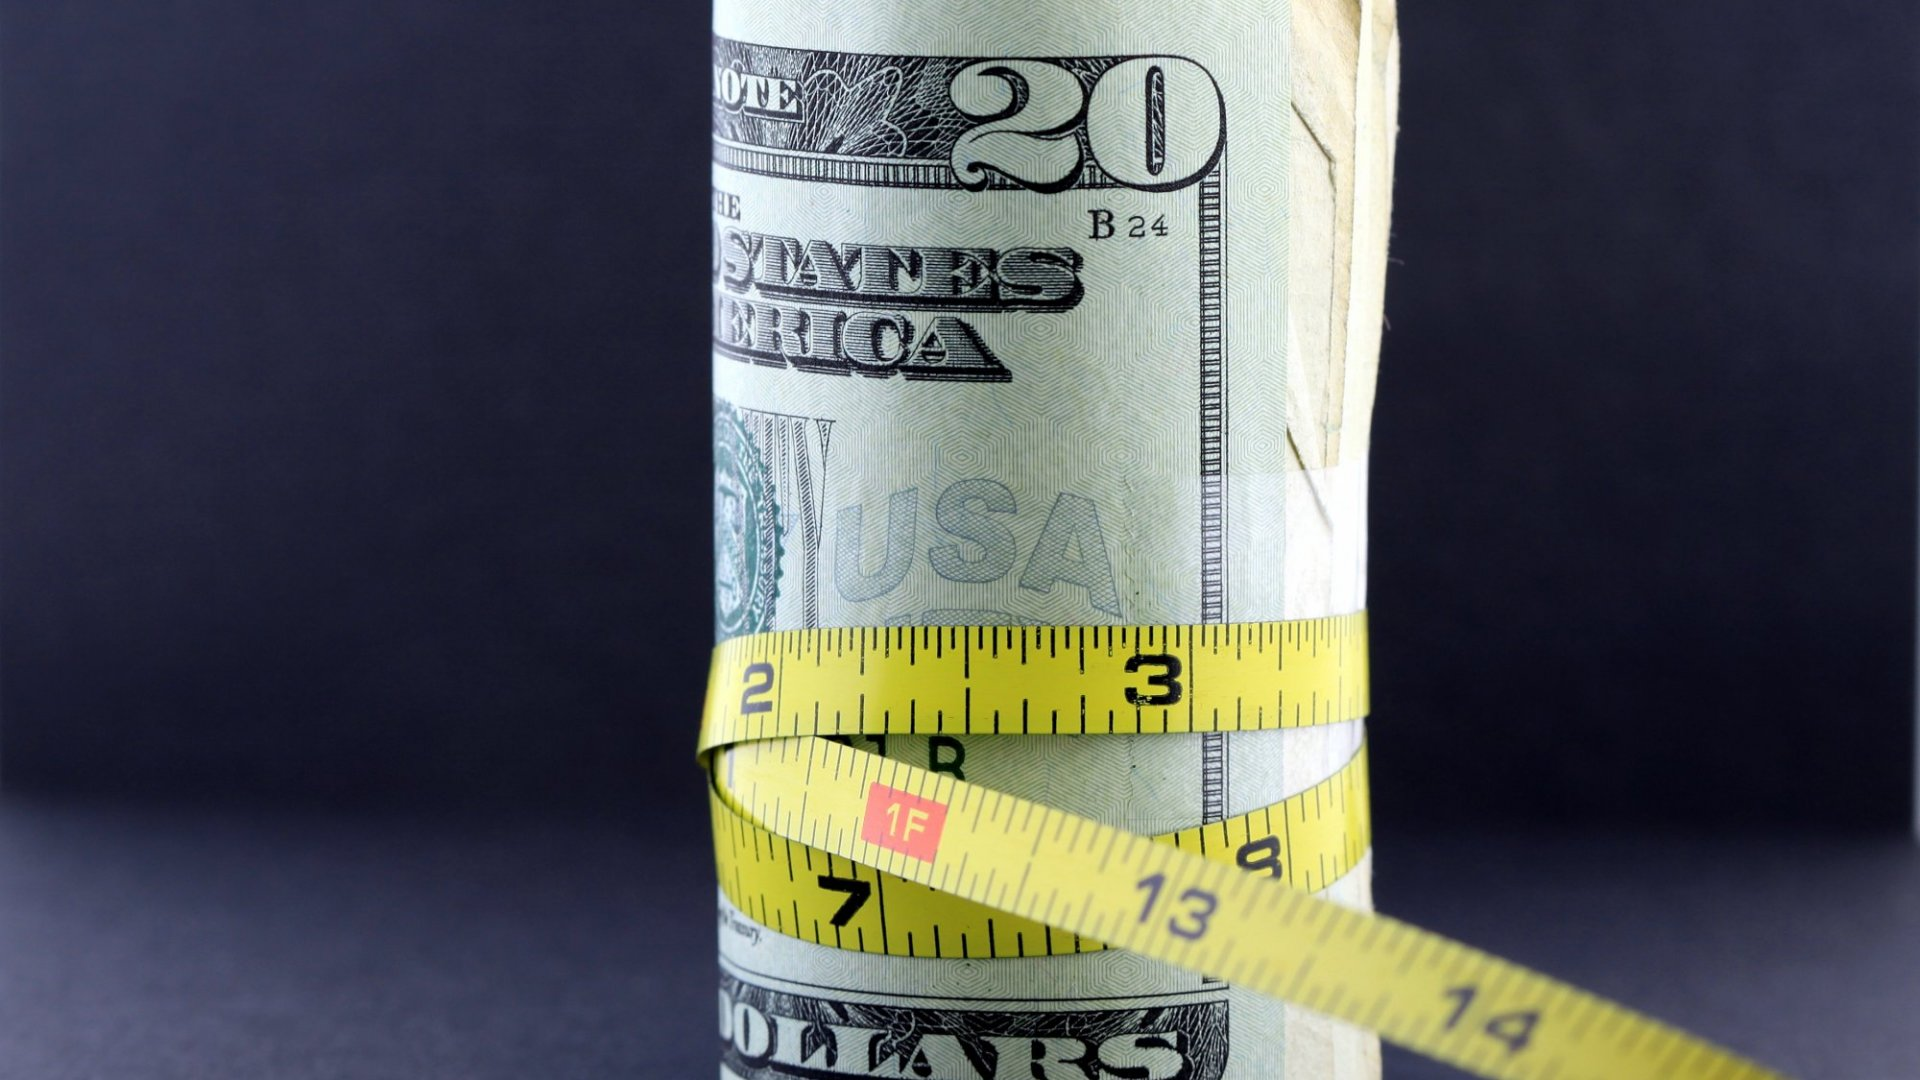 10 Times You Should Take a Pay Cut